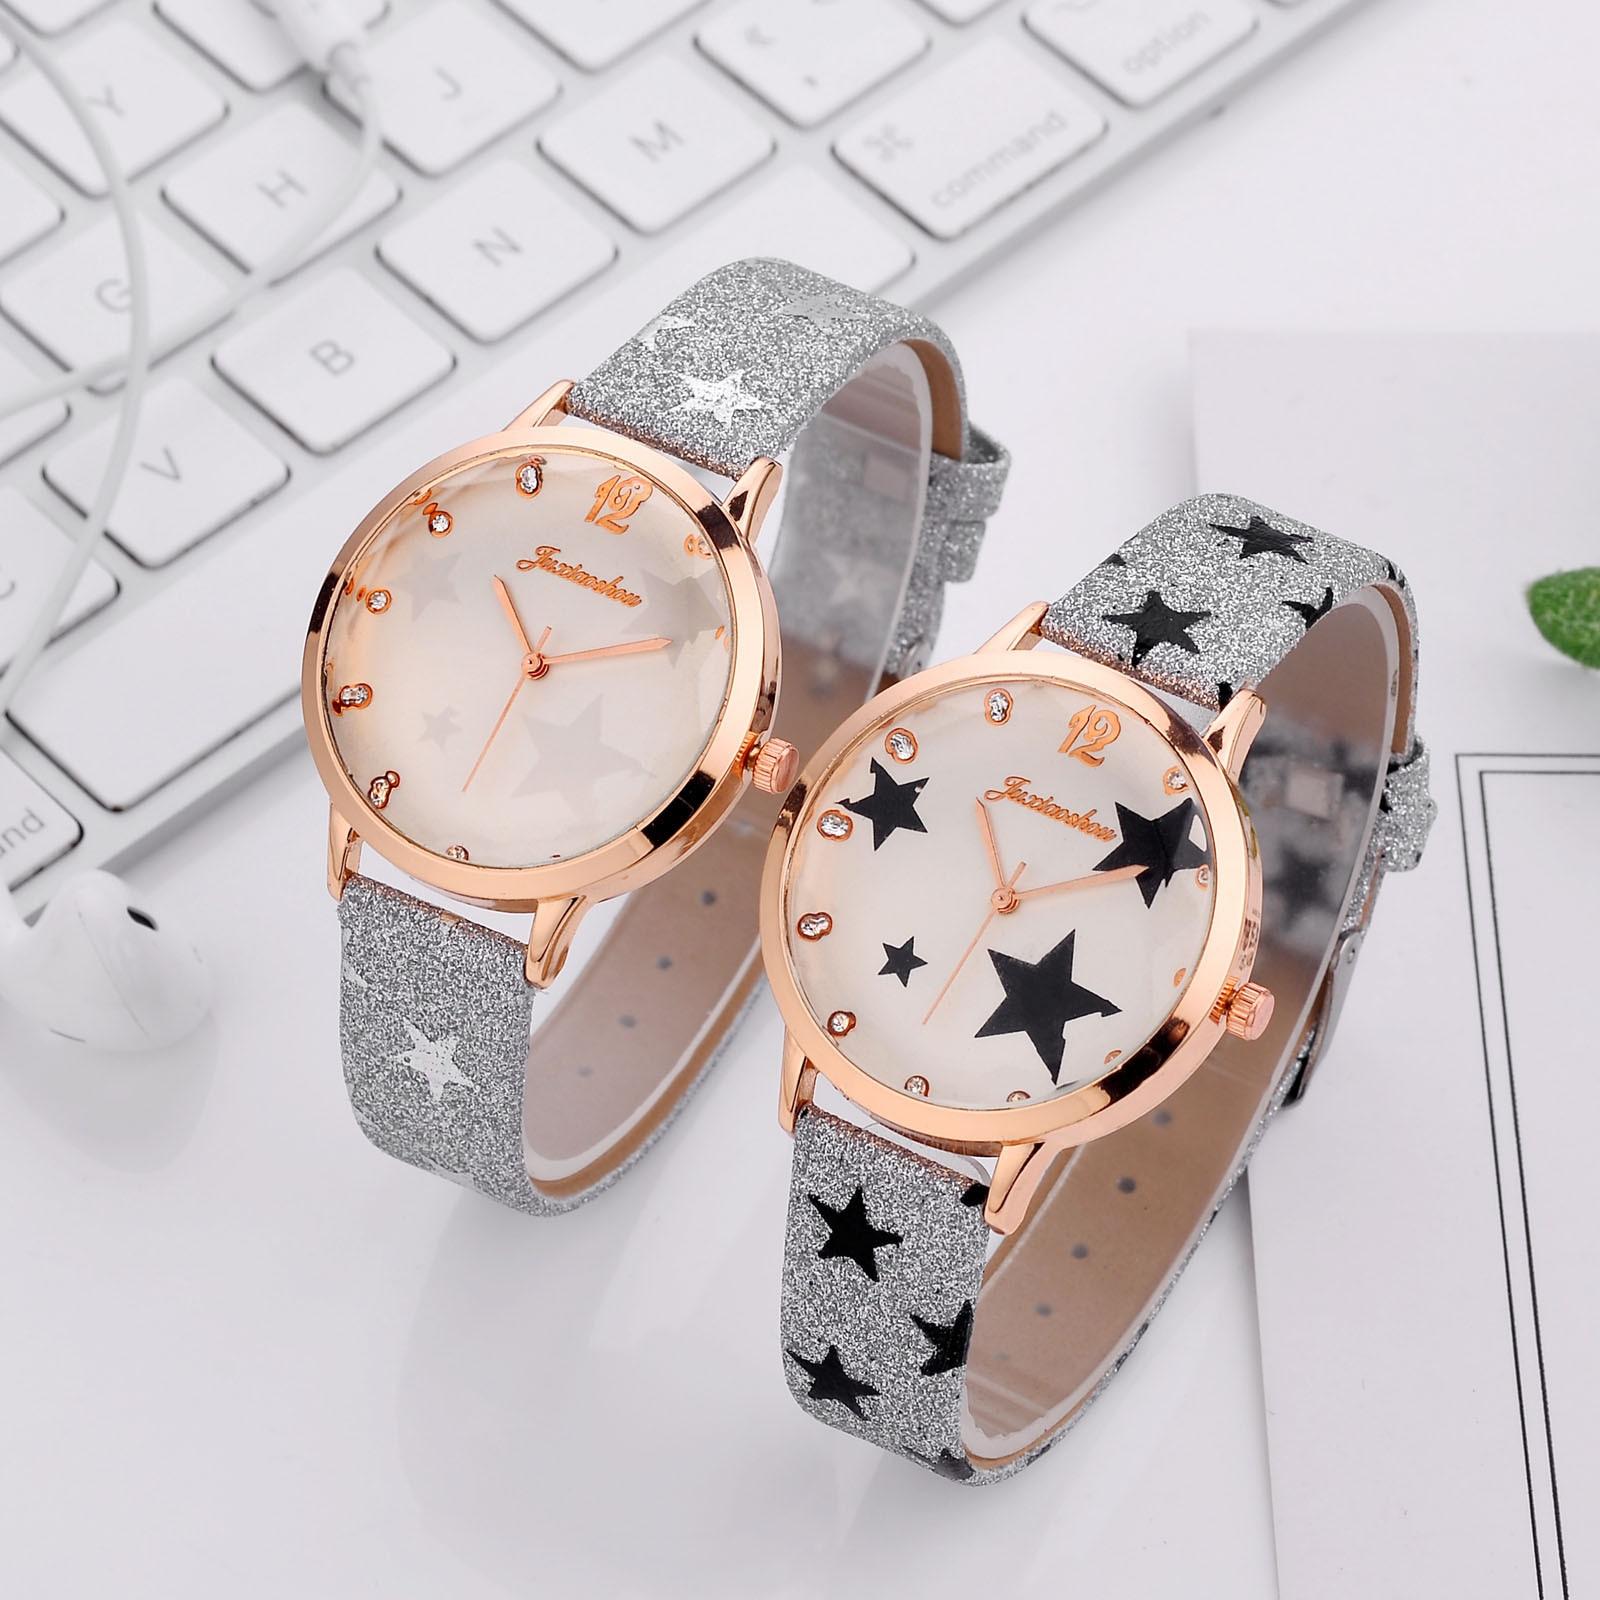 Ladies Quartz Watch Pentagram Printing Leather Strap Rotating Watch Часы Женские Нару